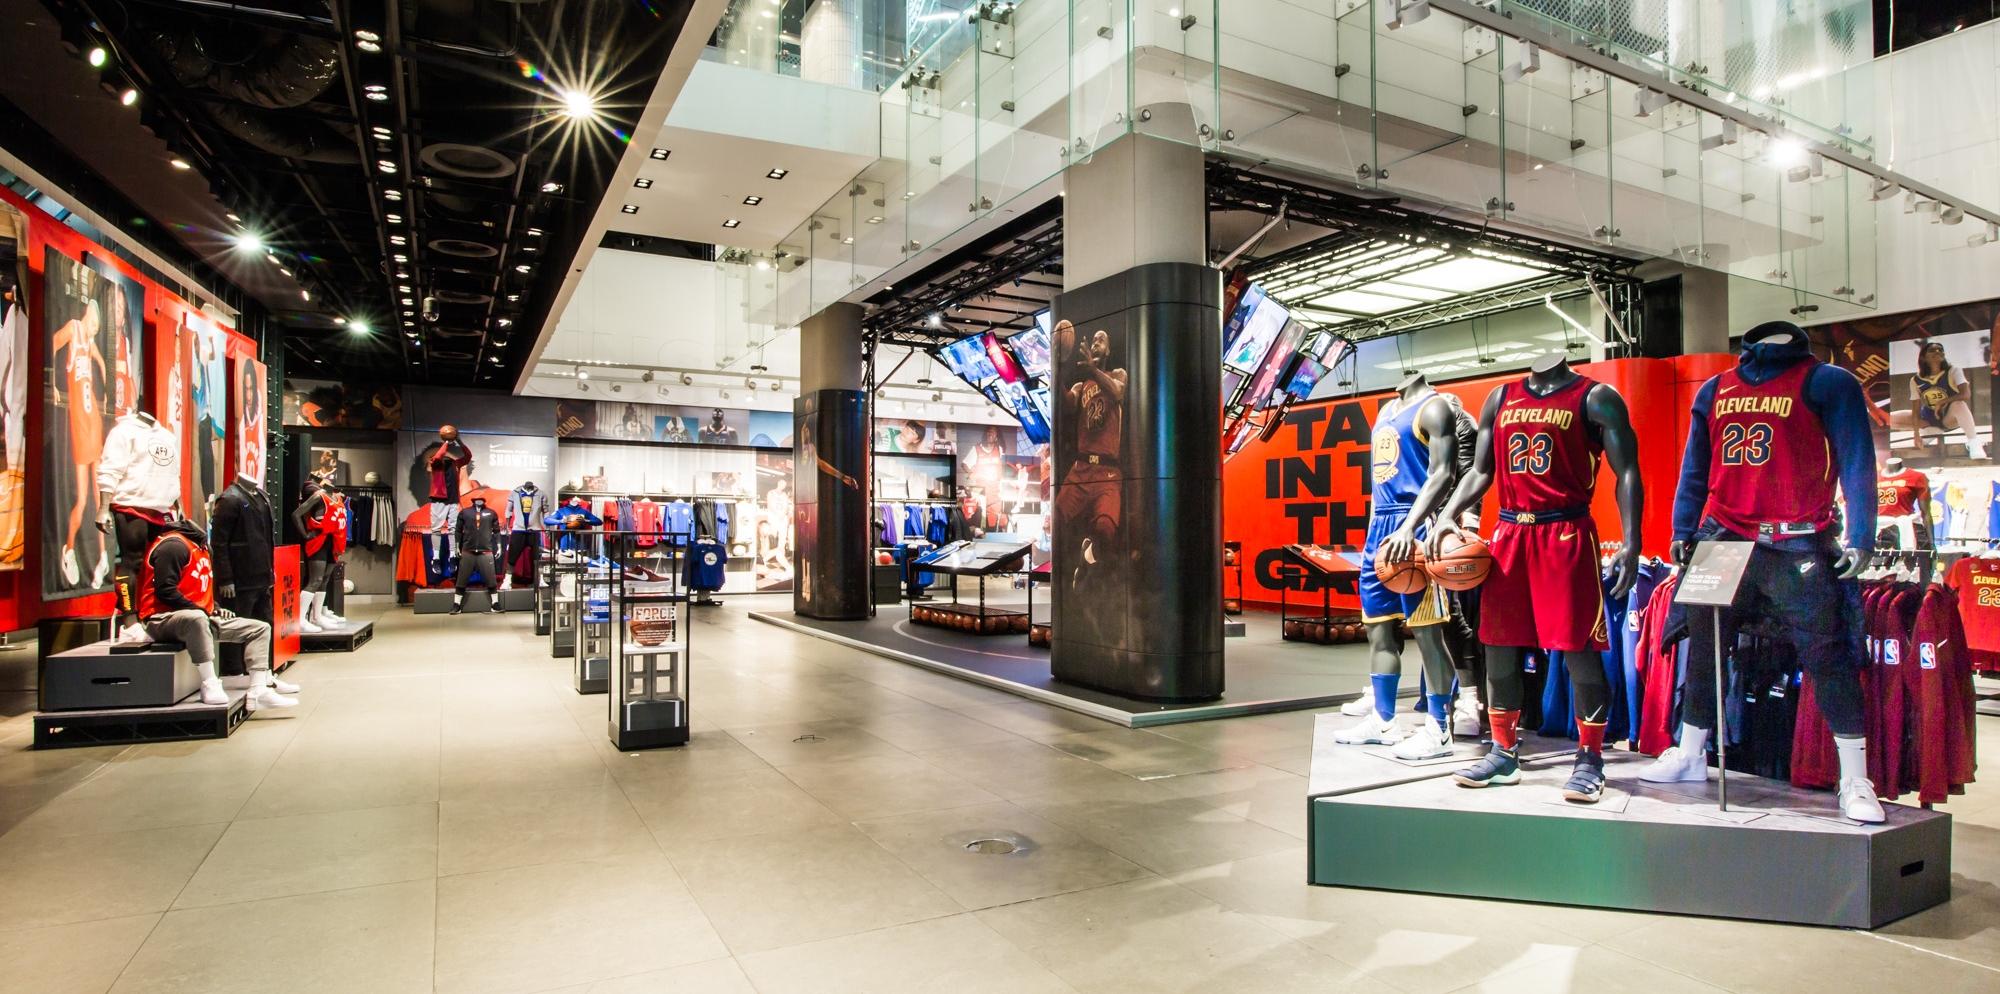 TDM_3156 - Nike - NBA Launch - NTL - Tom D Morgan - WEB.jpg